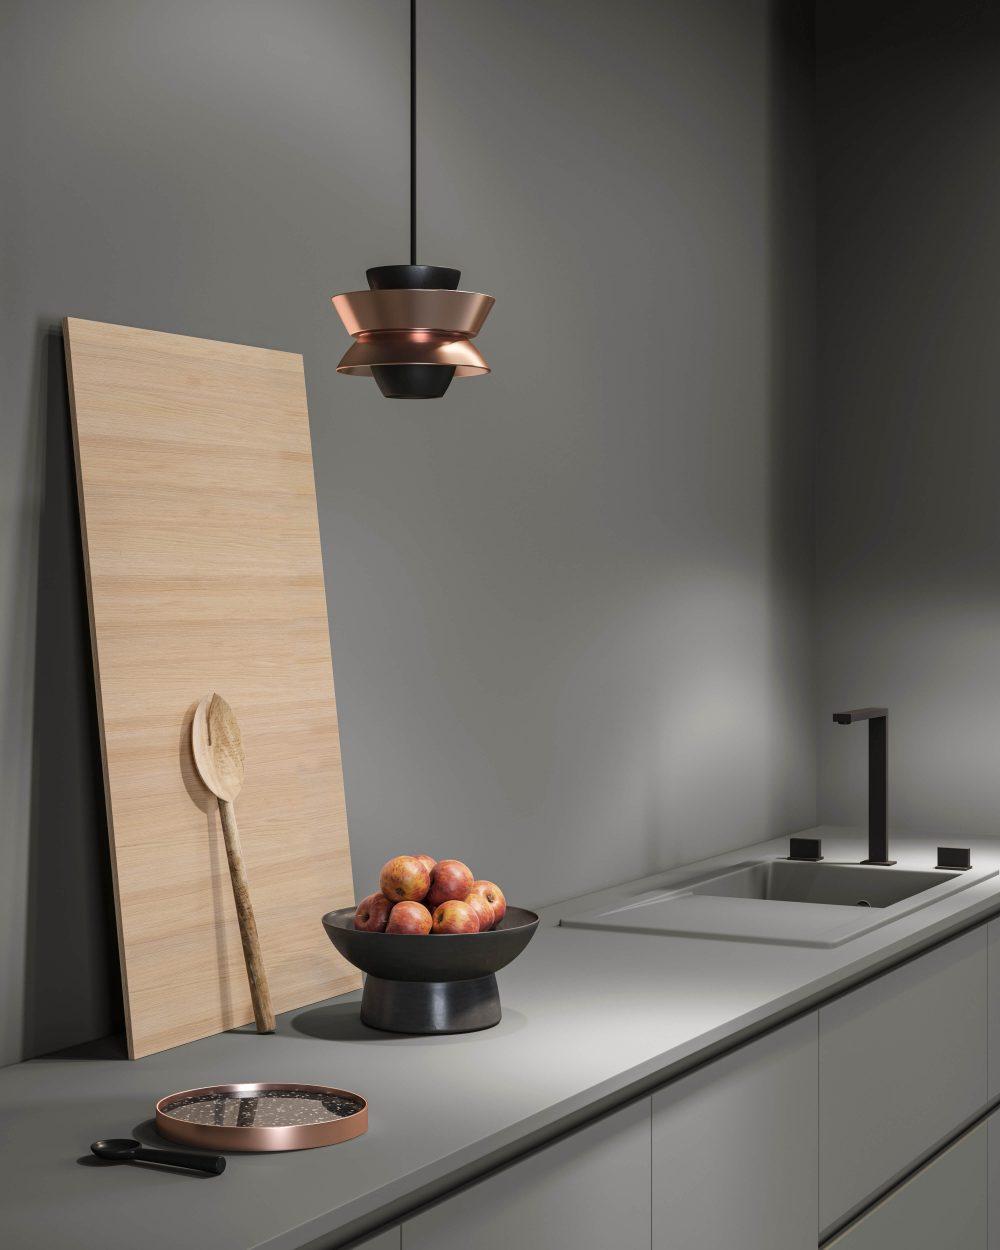 Mobili contenitori e boiserie in legno Garofoli per cucine moderne - Garofoli